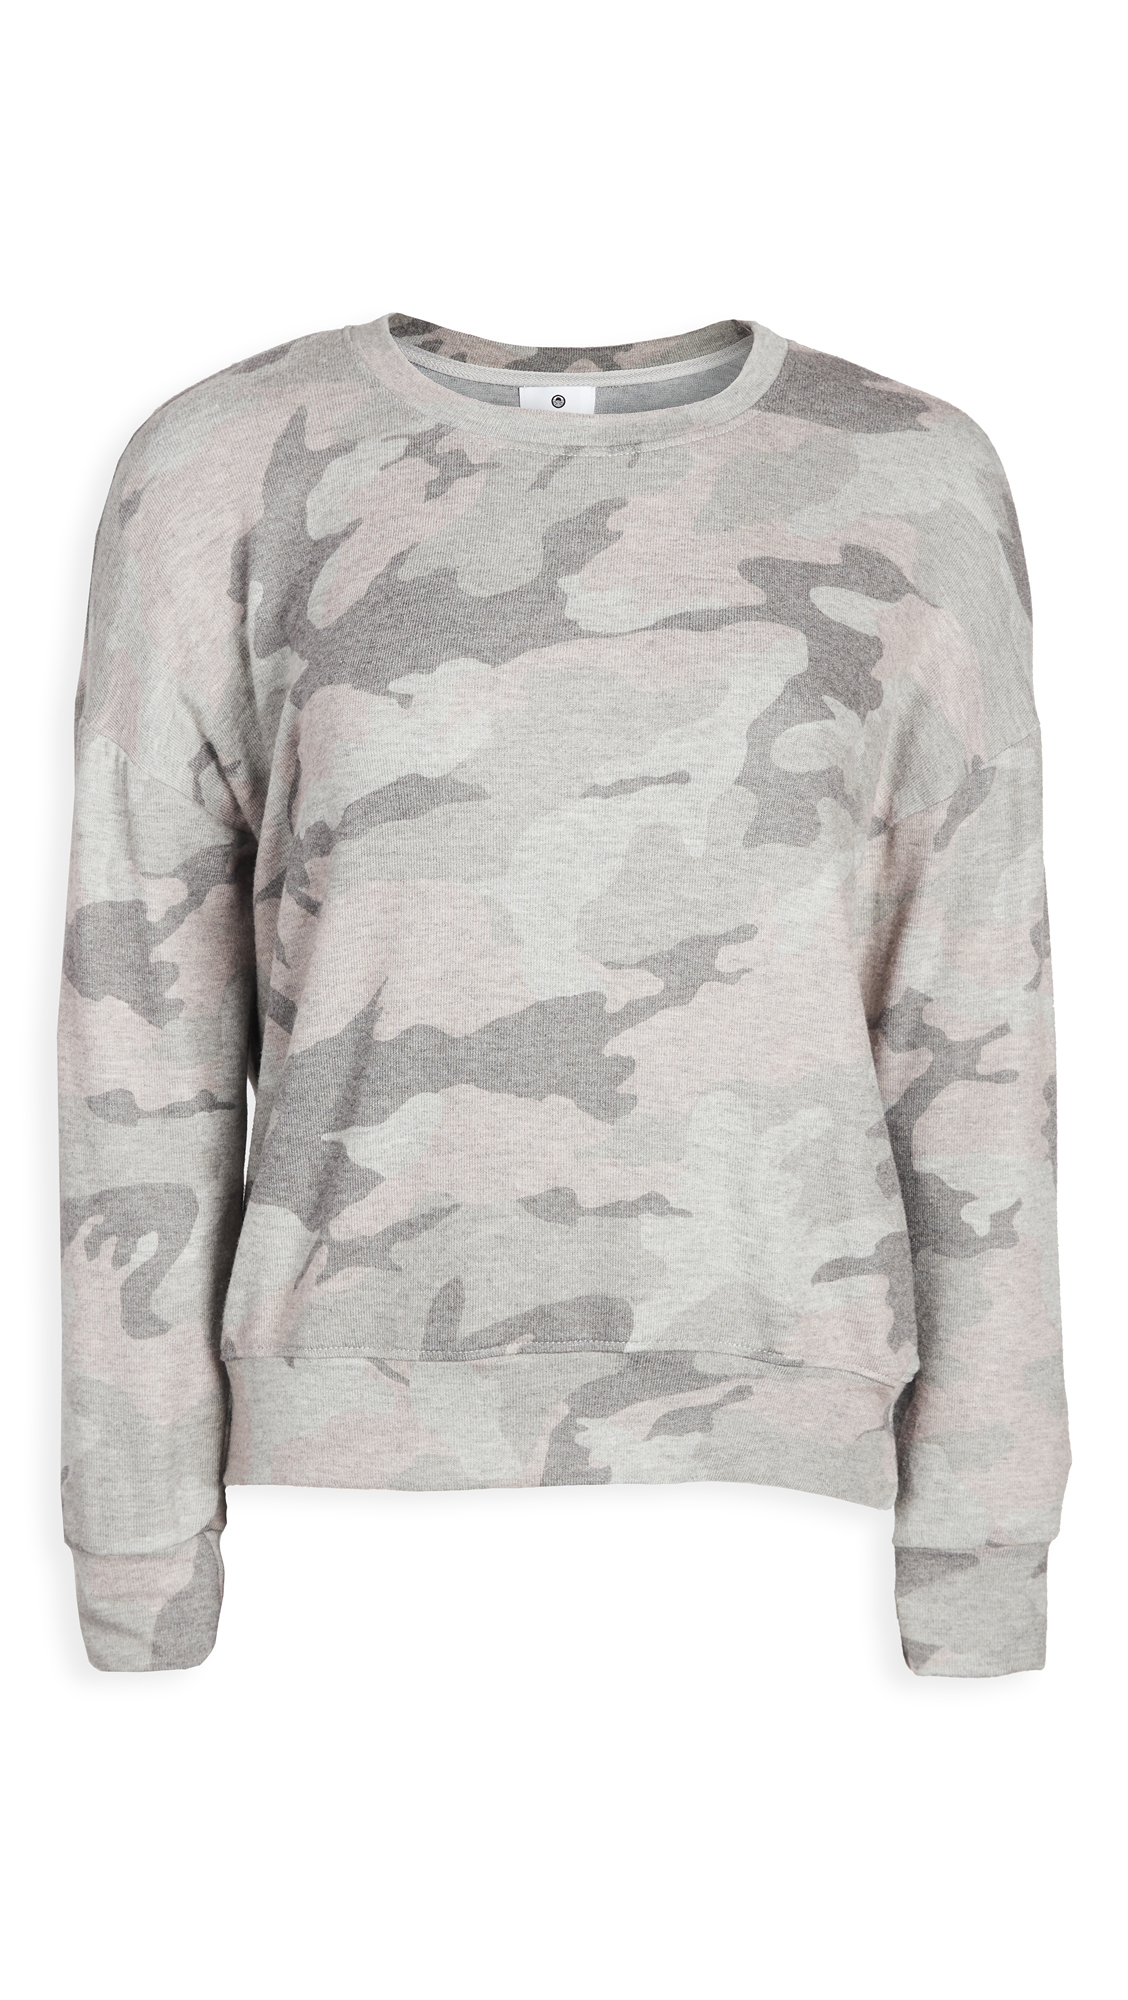 SUNDRY Camo Cozy Sweatshirt